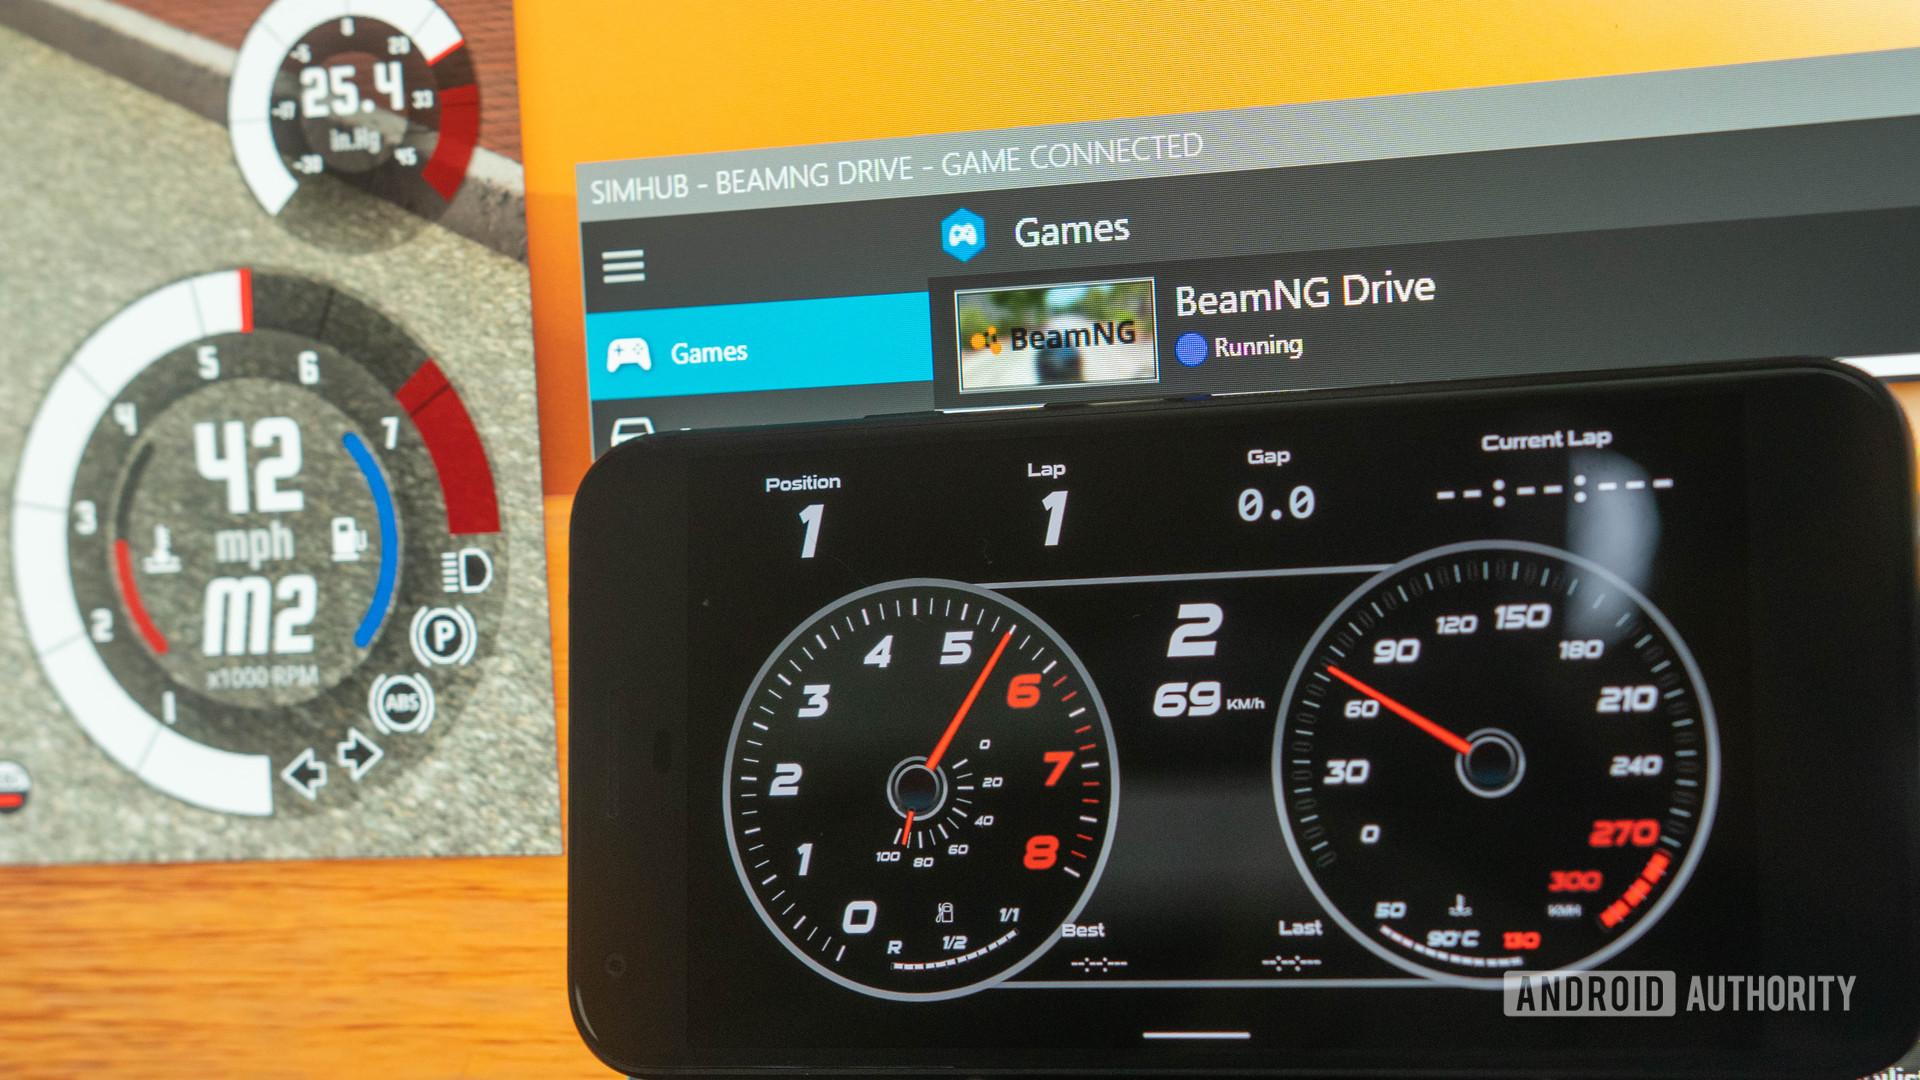 SimHub app next to Windows PC sim racing dashboard